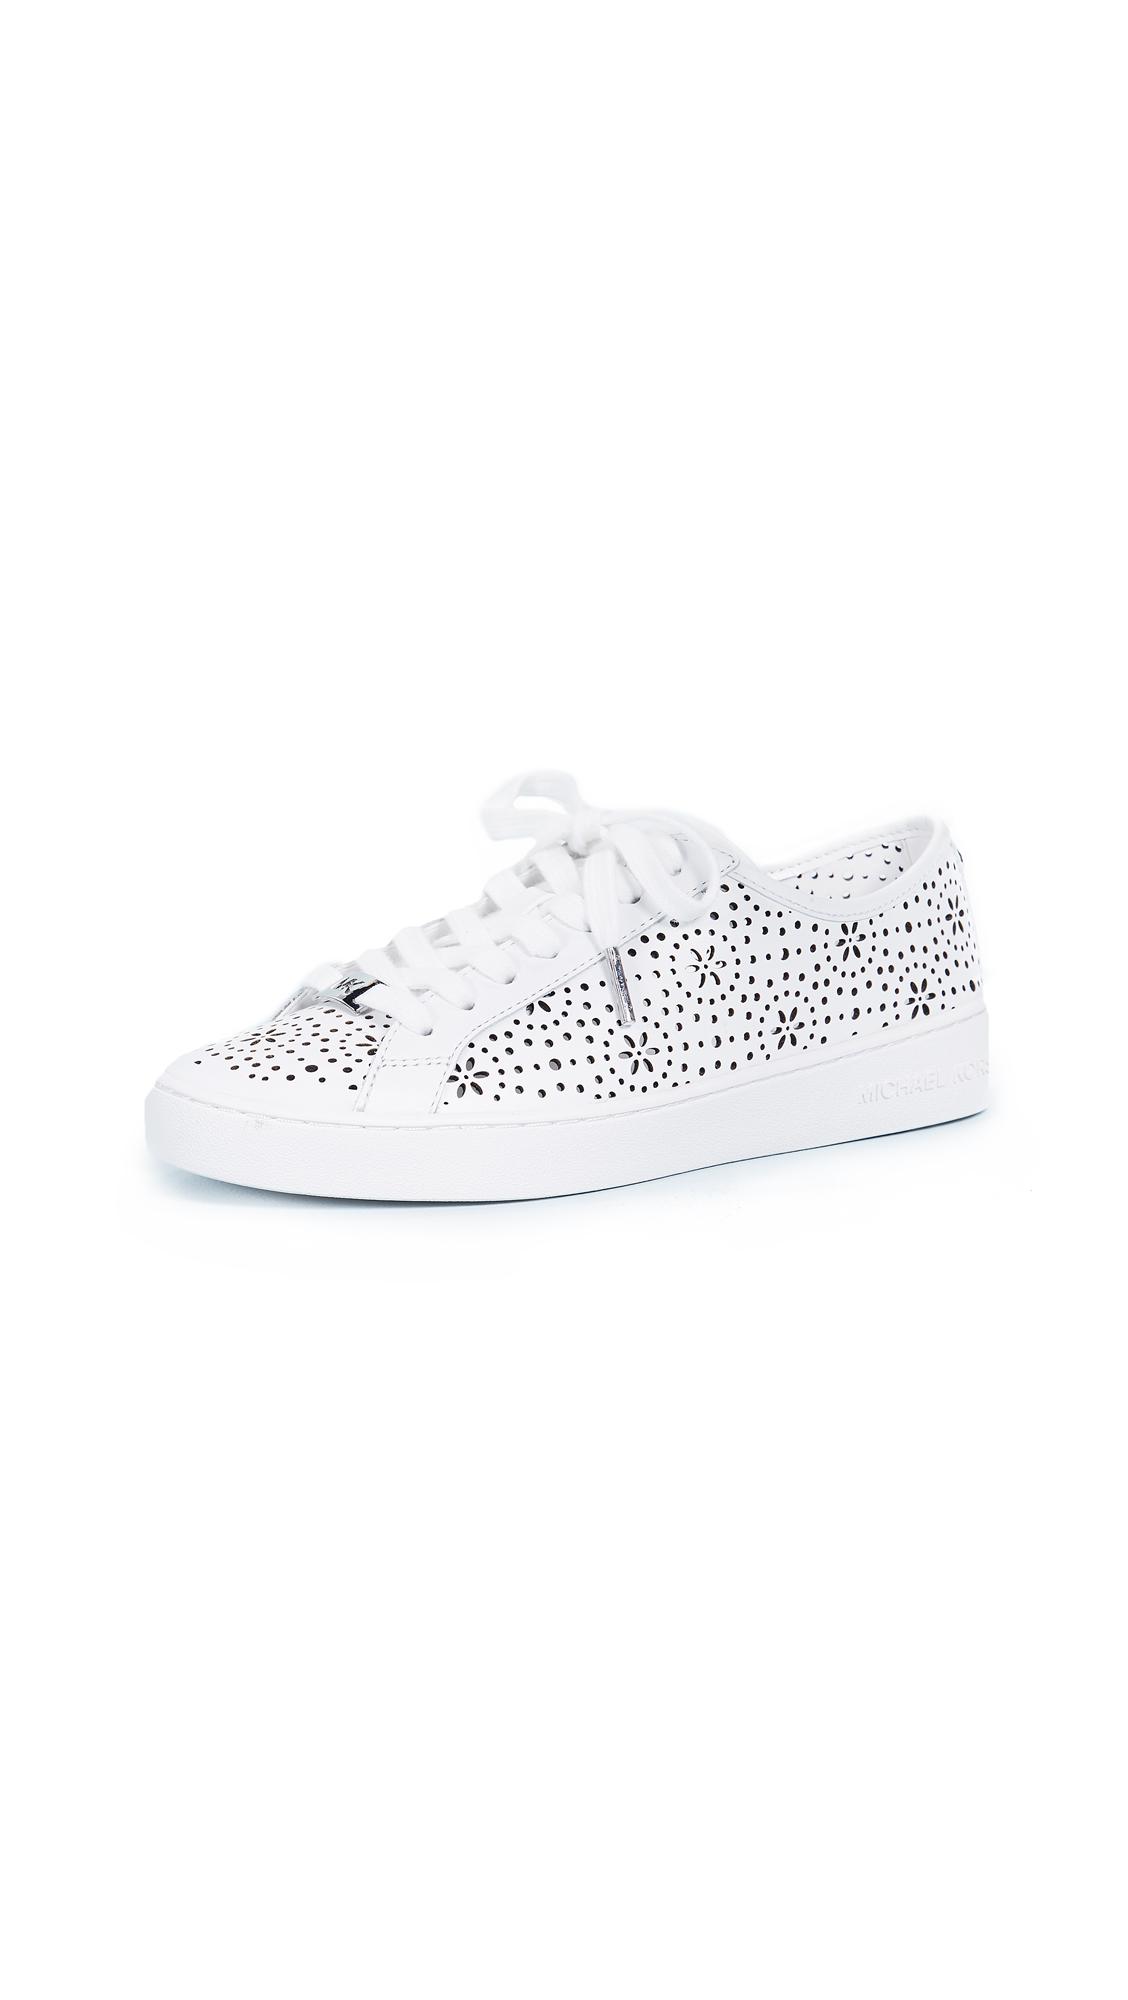 MICHAEL Michael Kors Keaton Lace Up Sneakers - Optic White